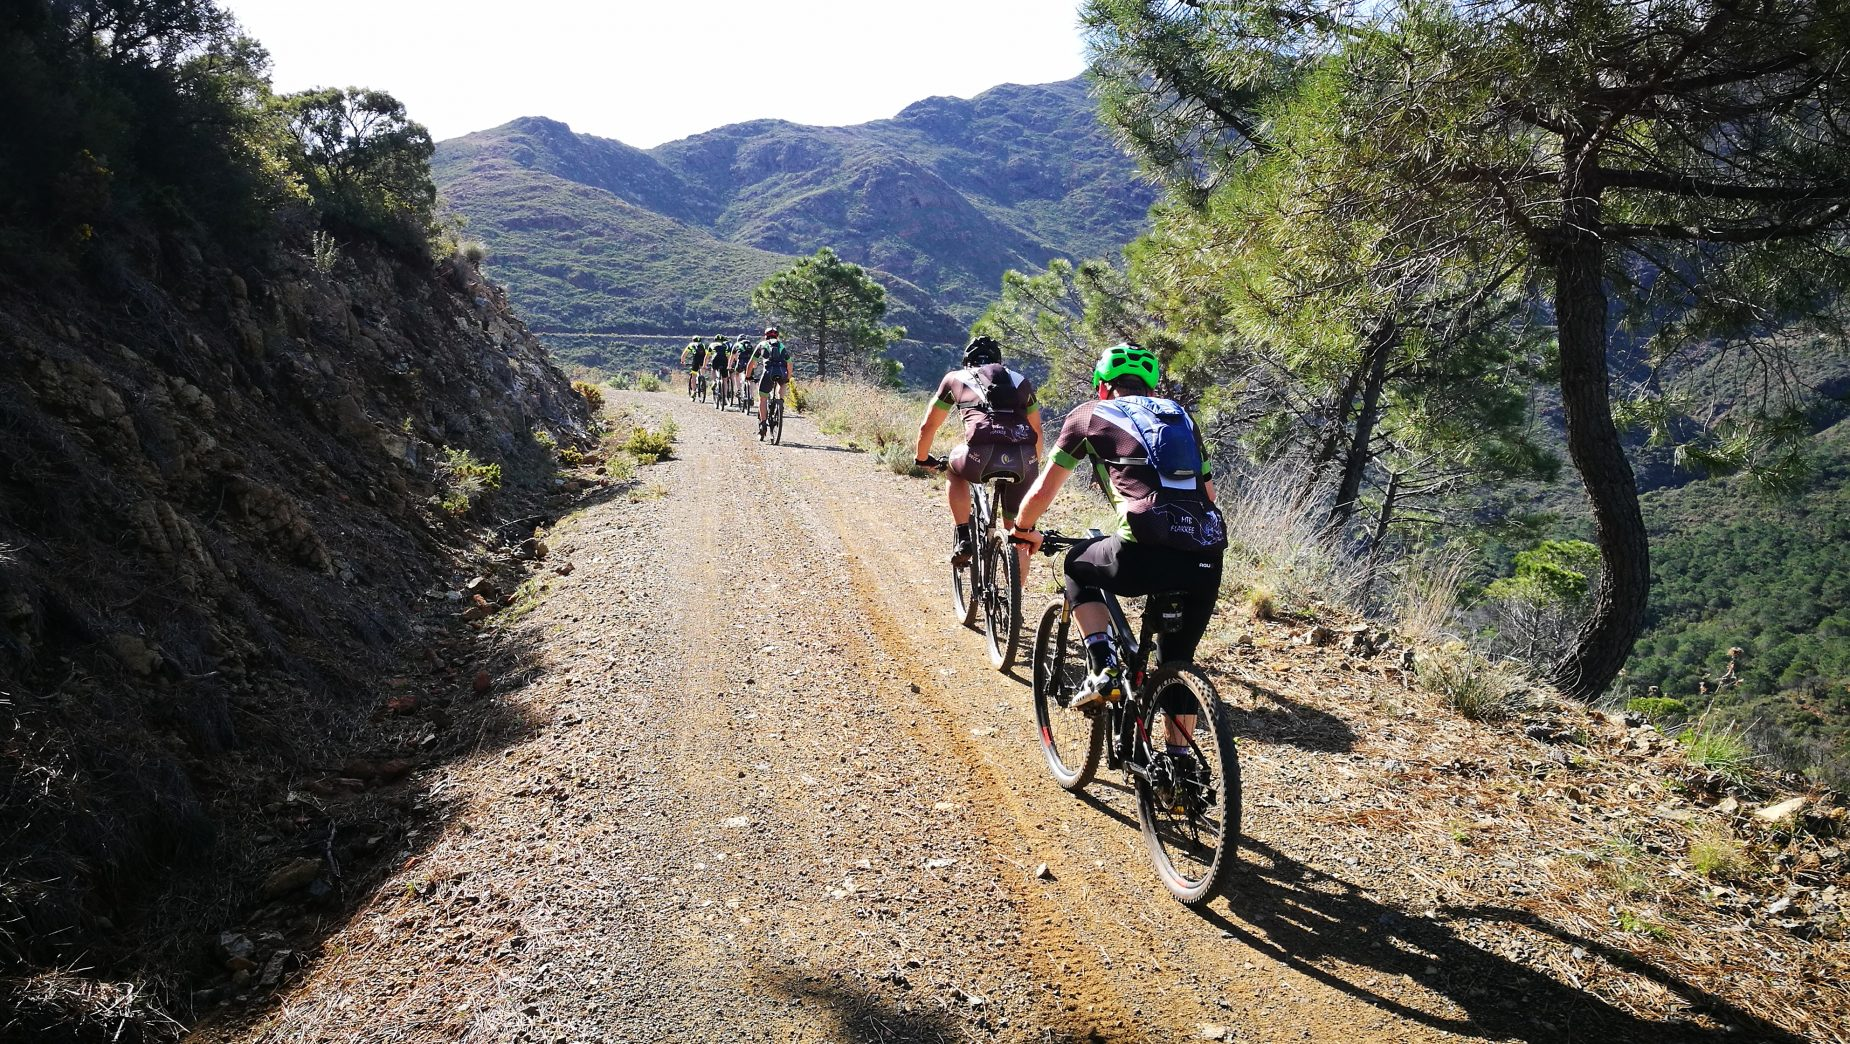 fietsen-in-Malaga-Gravel-rijden